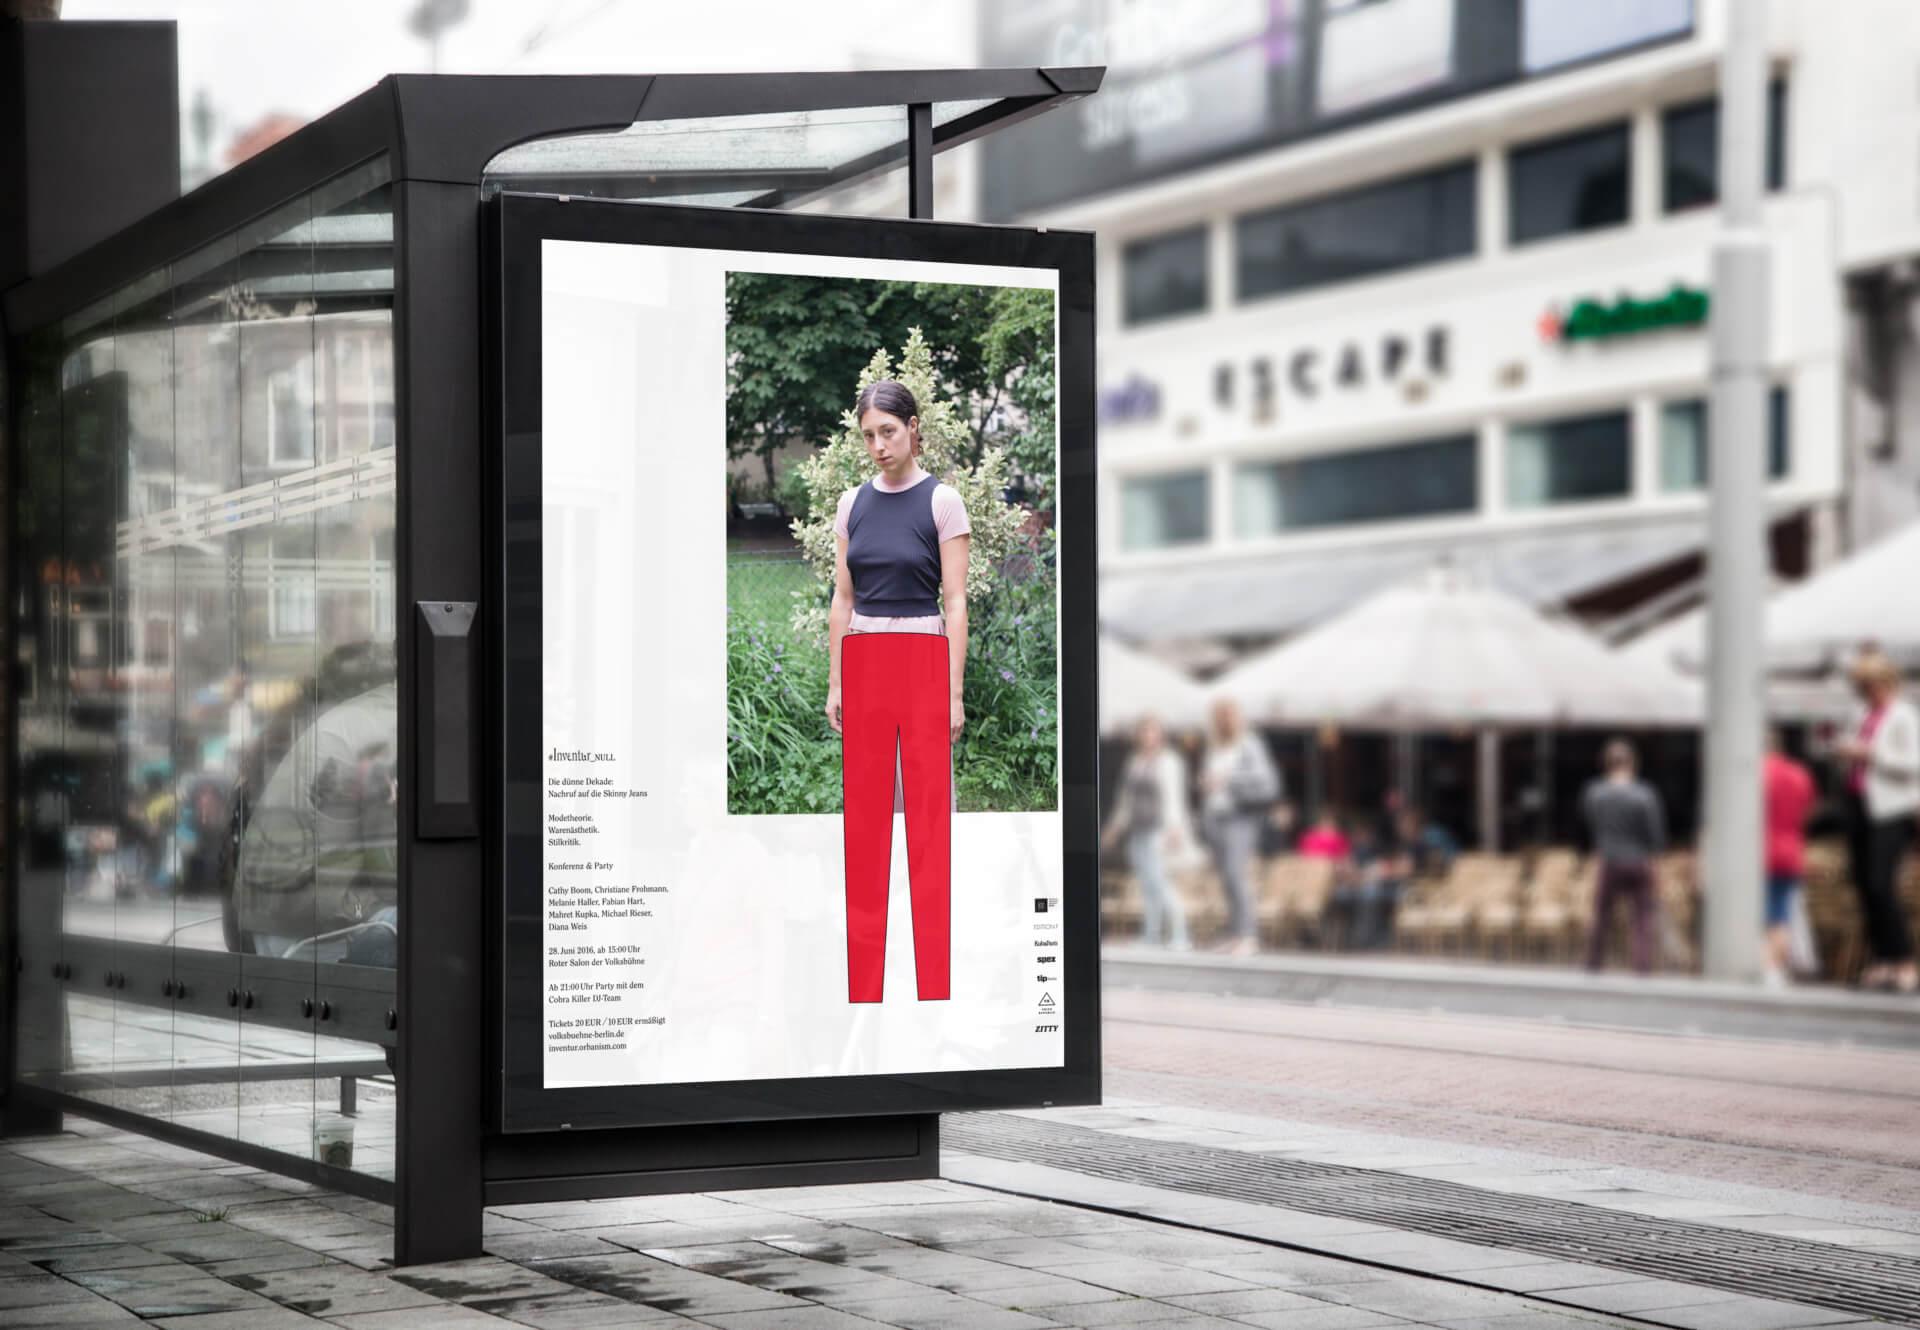 preggnant agency berlin/bonn INVENTUR